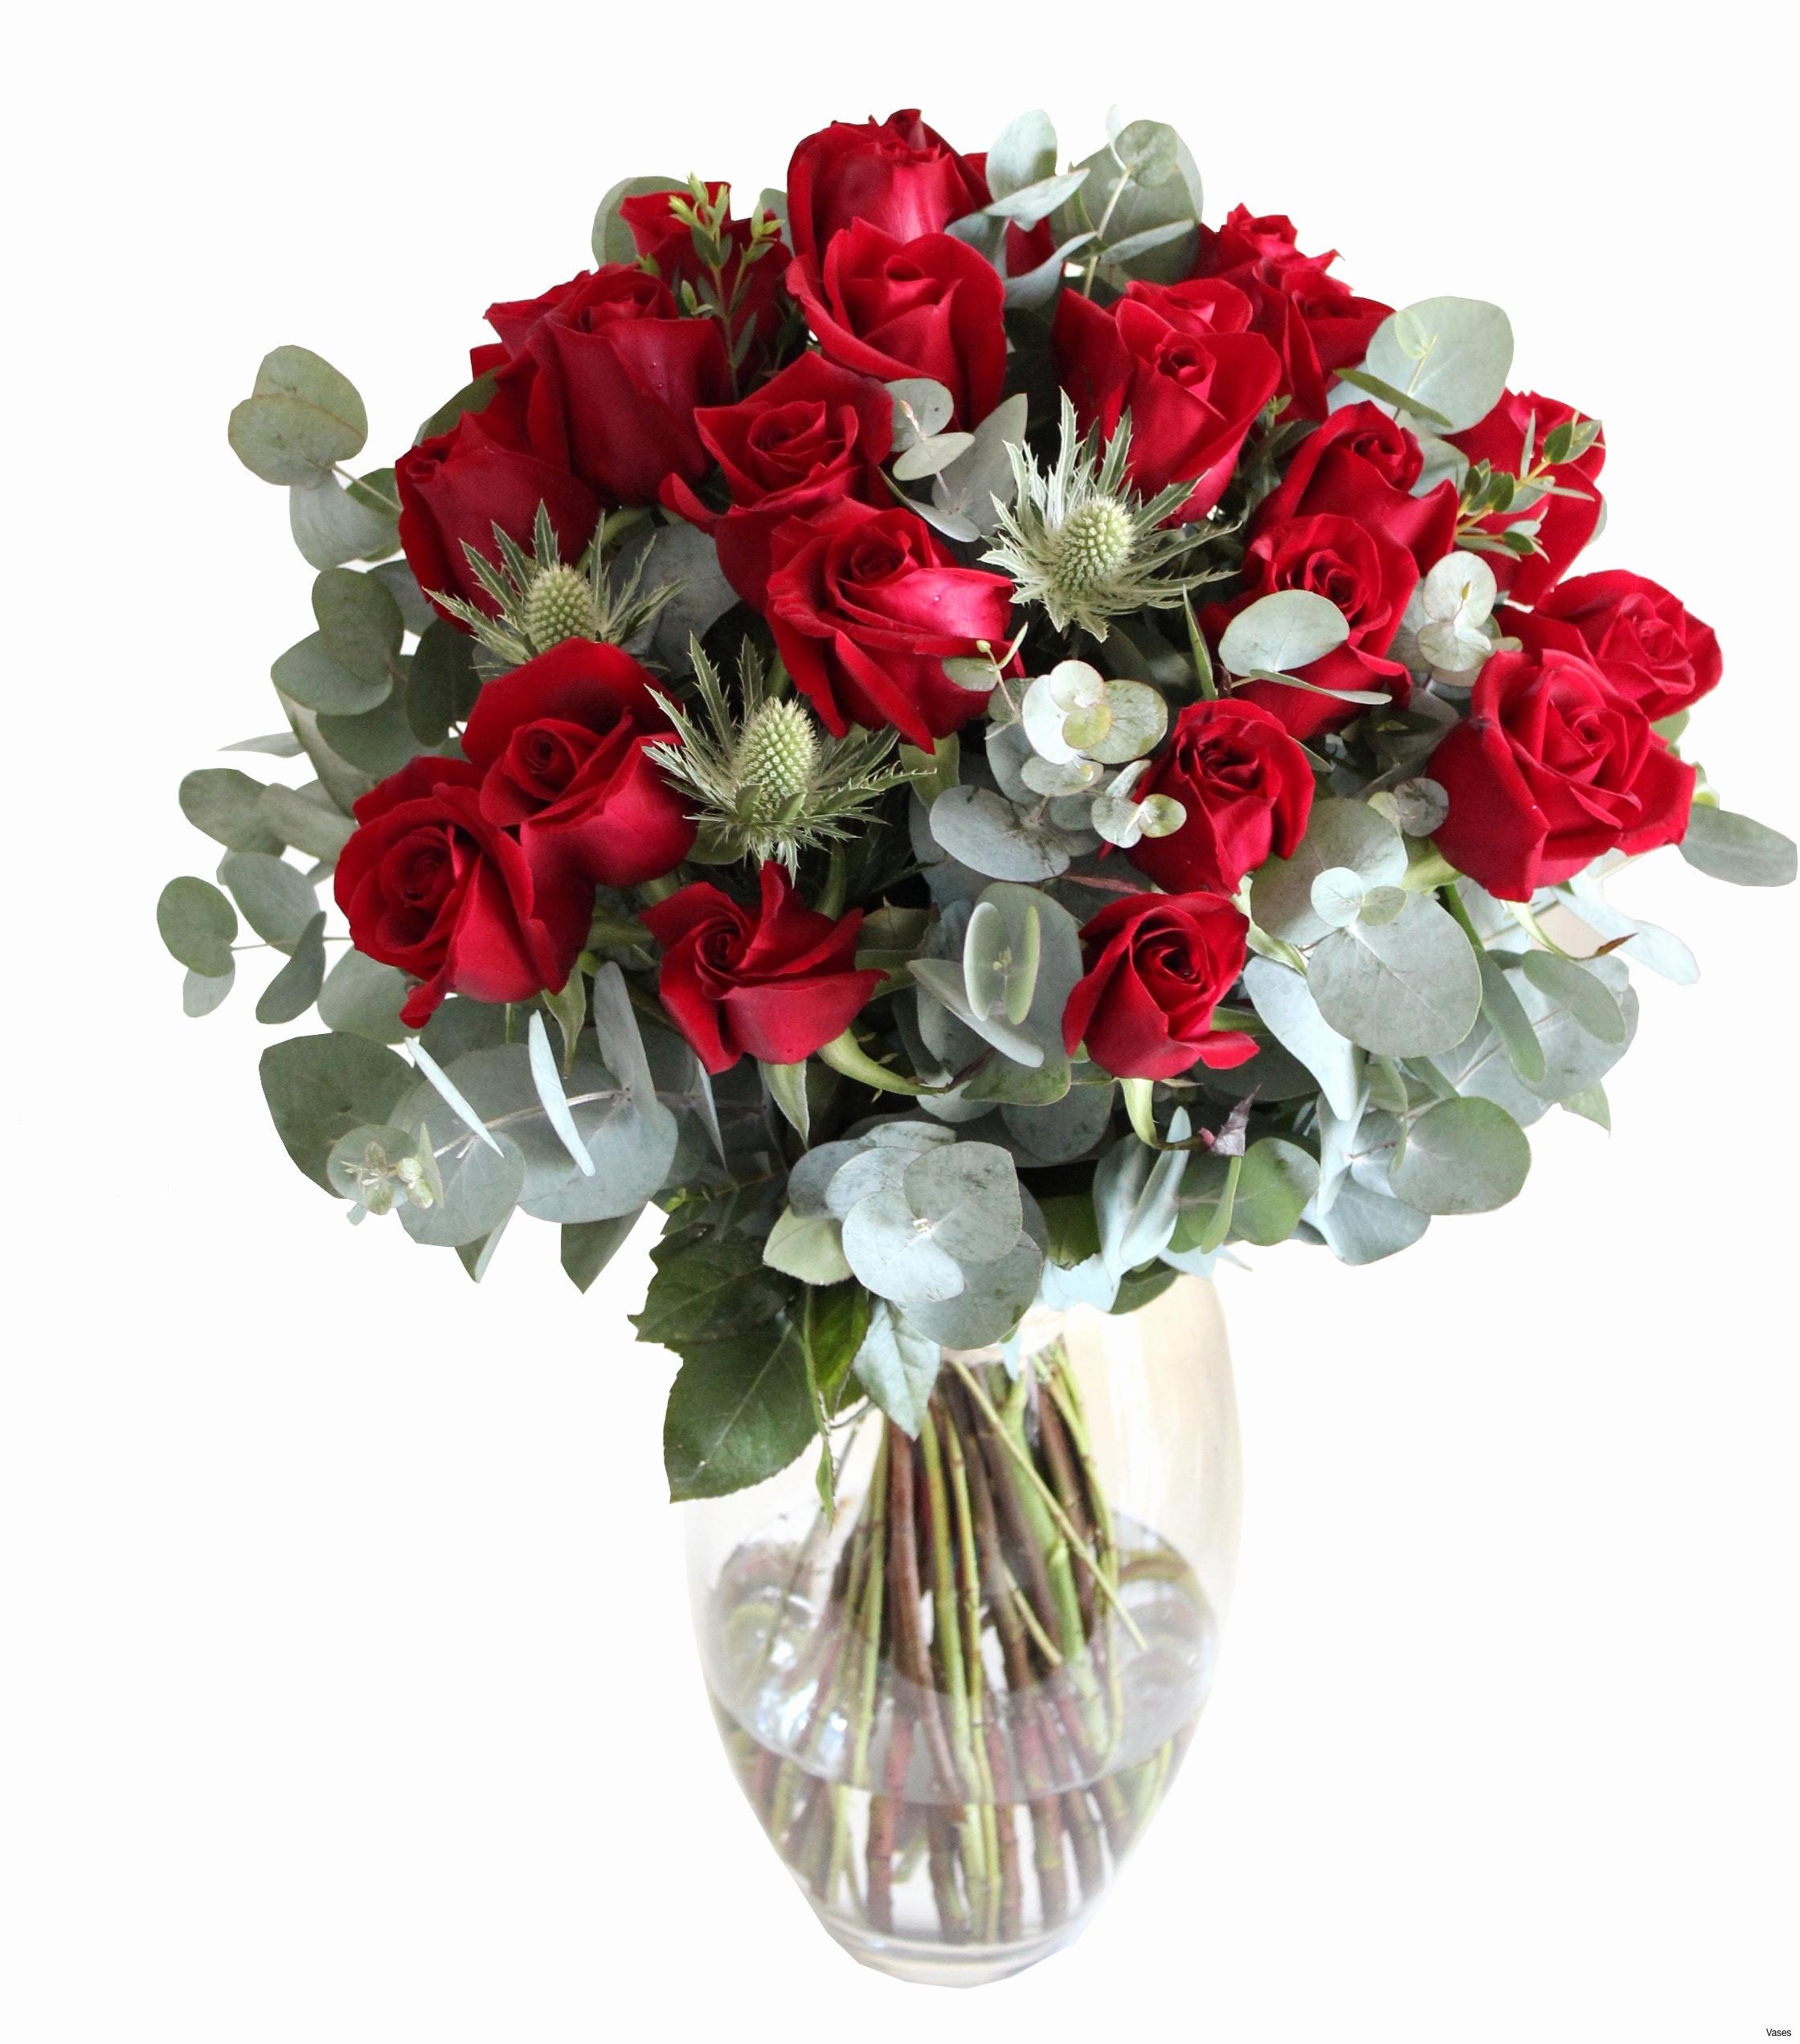 shell vase filler of 24 glass vase pics to color fresh 24 red roses in vaseh vases i 0d in 24 glass vase pics to color fresh 24 red roses in vaseh vases i 0d to color design